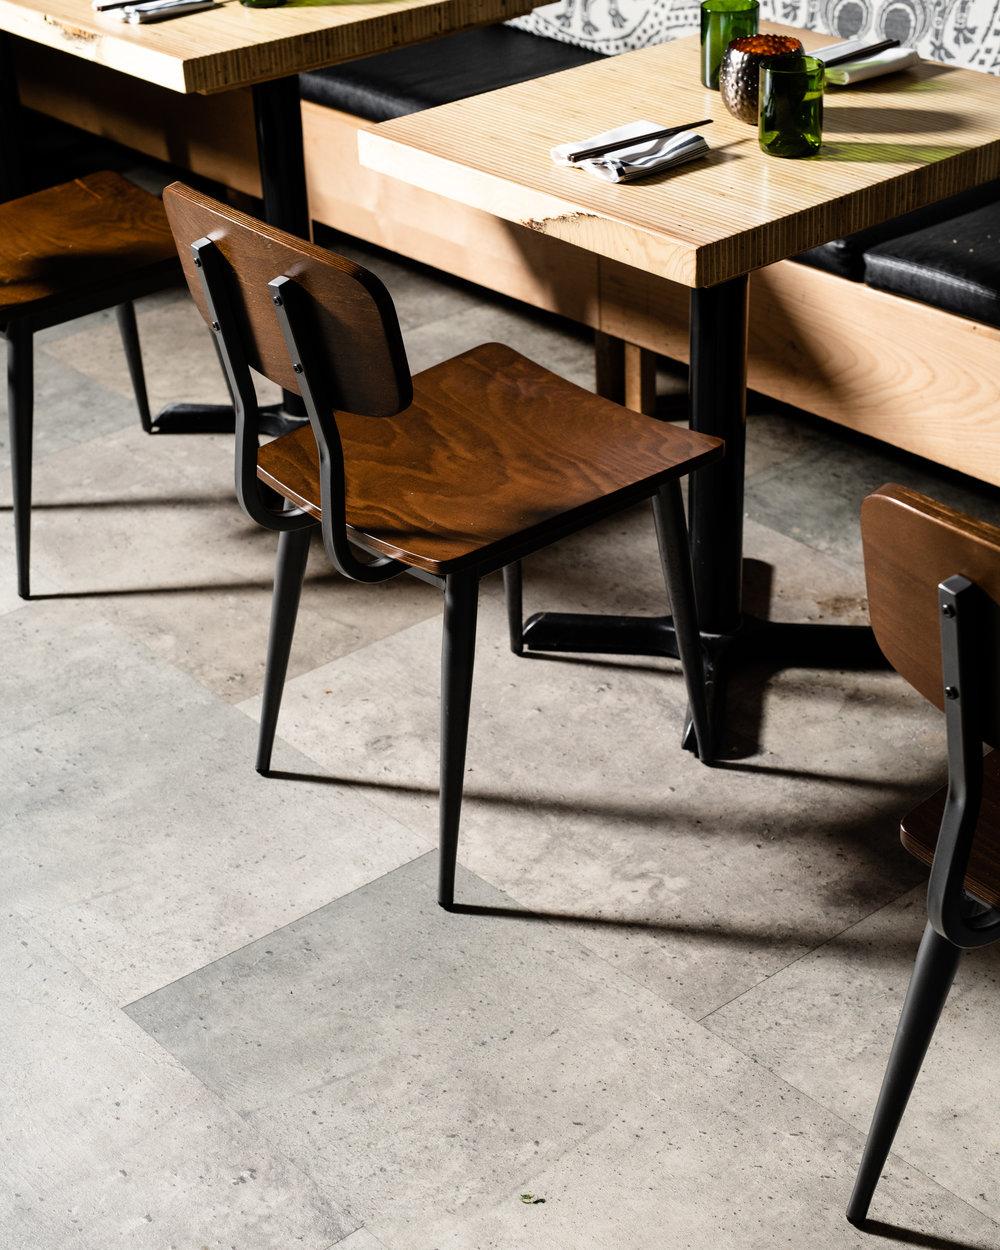 Sticks & Stones - New Chairs - 0322.jpg